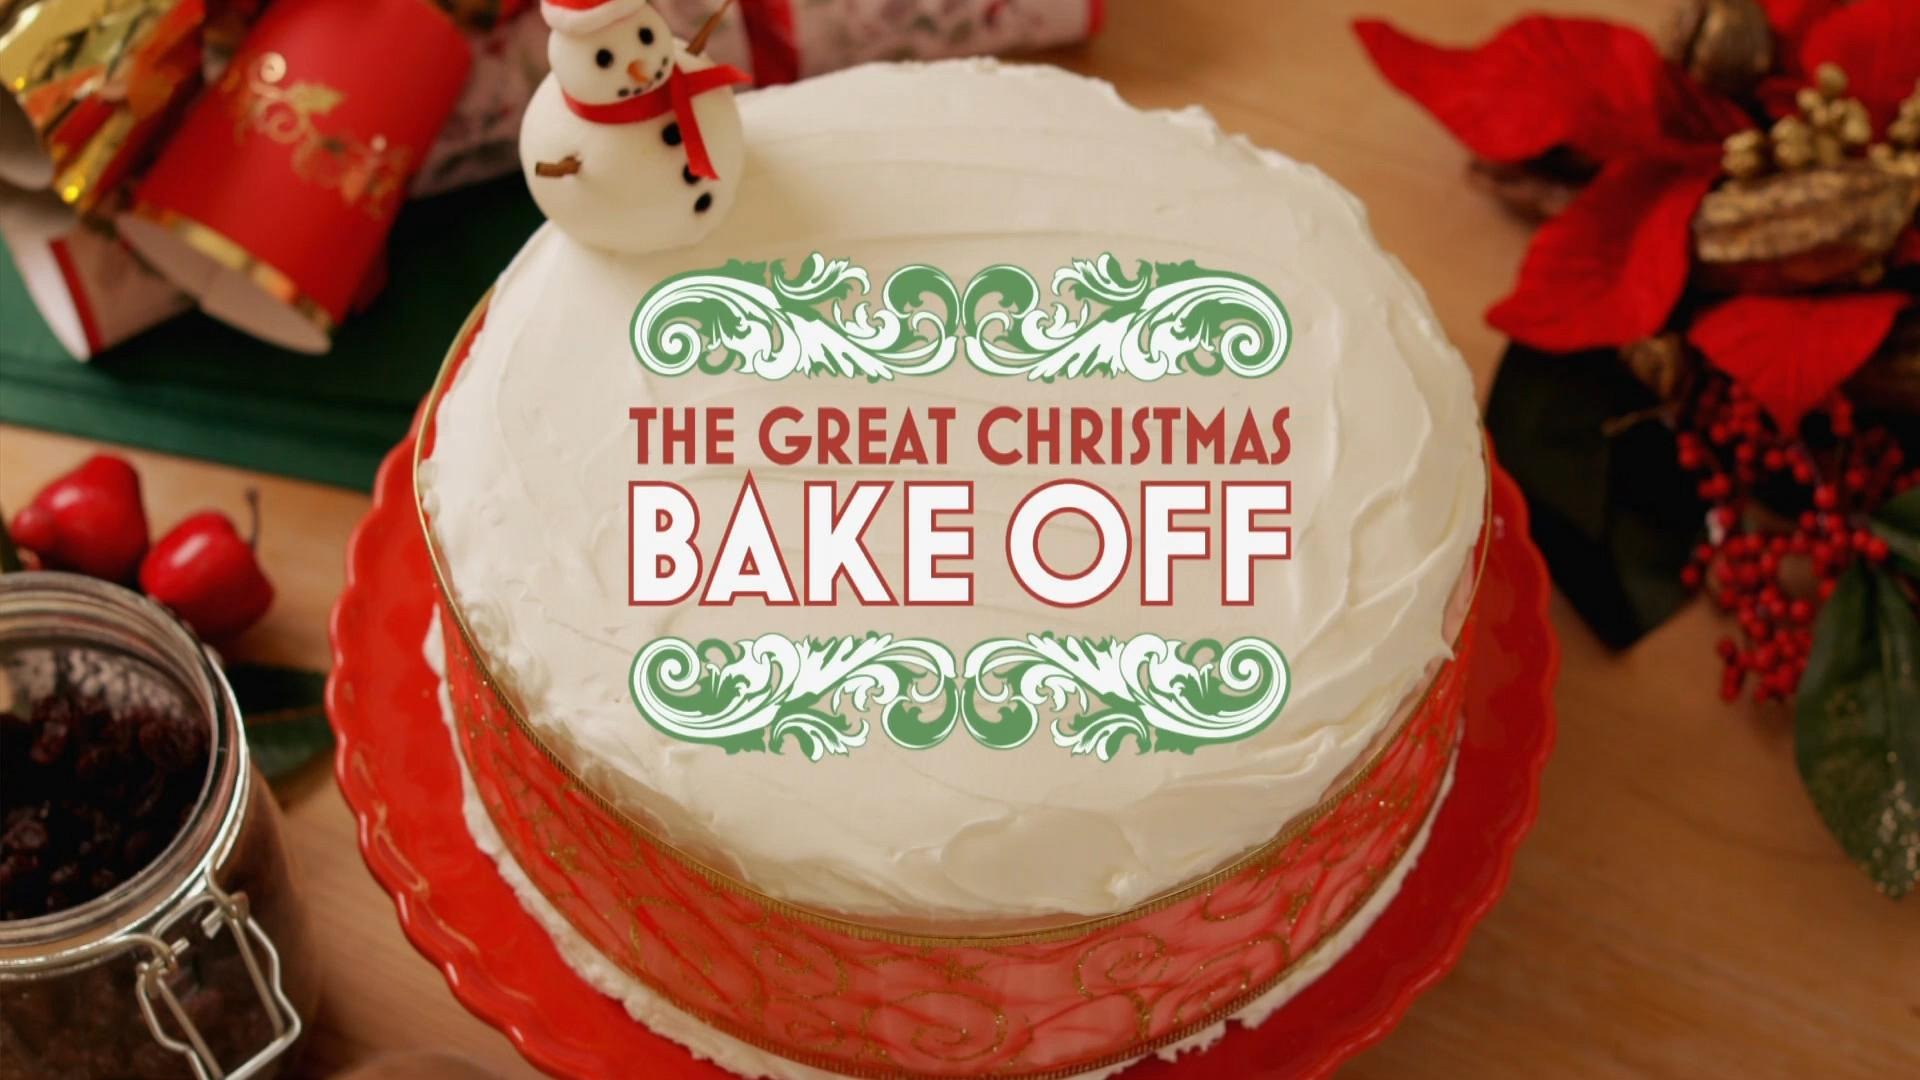 Christmas Bake Off 2021 The Great British Baking Show The Great Christmas Bake Off Tv Episode 2018 Imdb